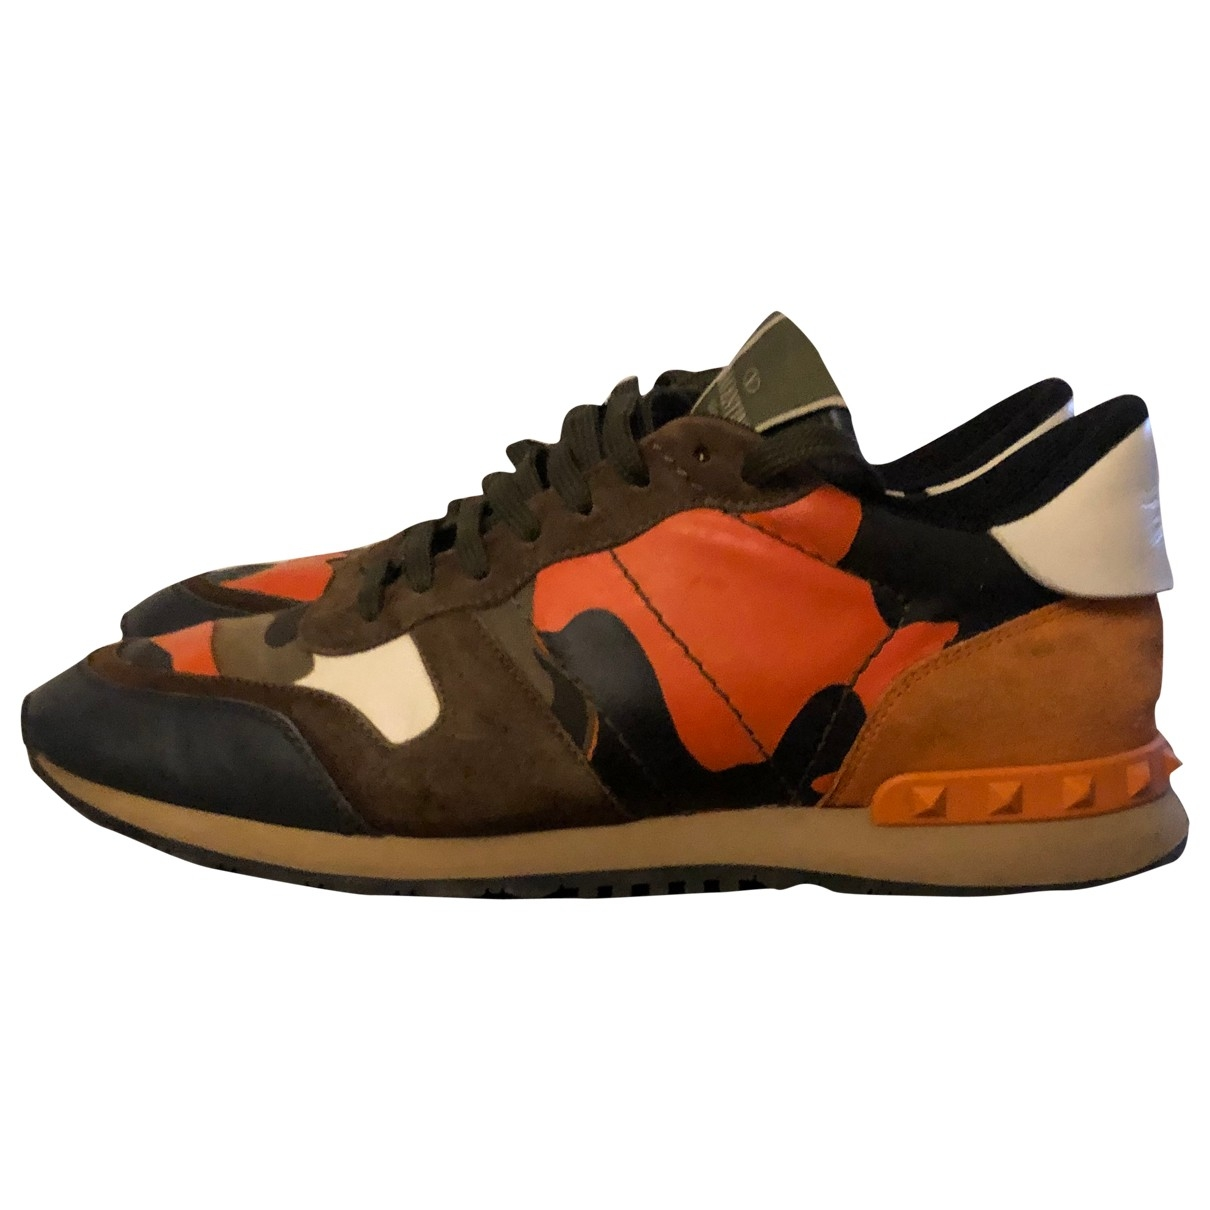 Valentino Garavani Rockrunner Orange Leather Trainers for Men 42 IT